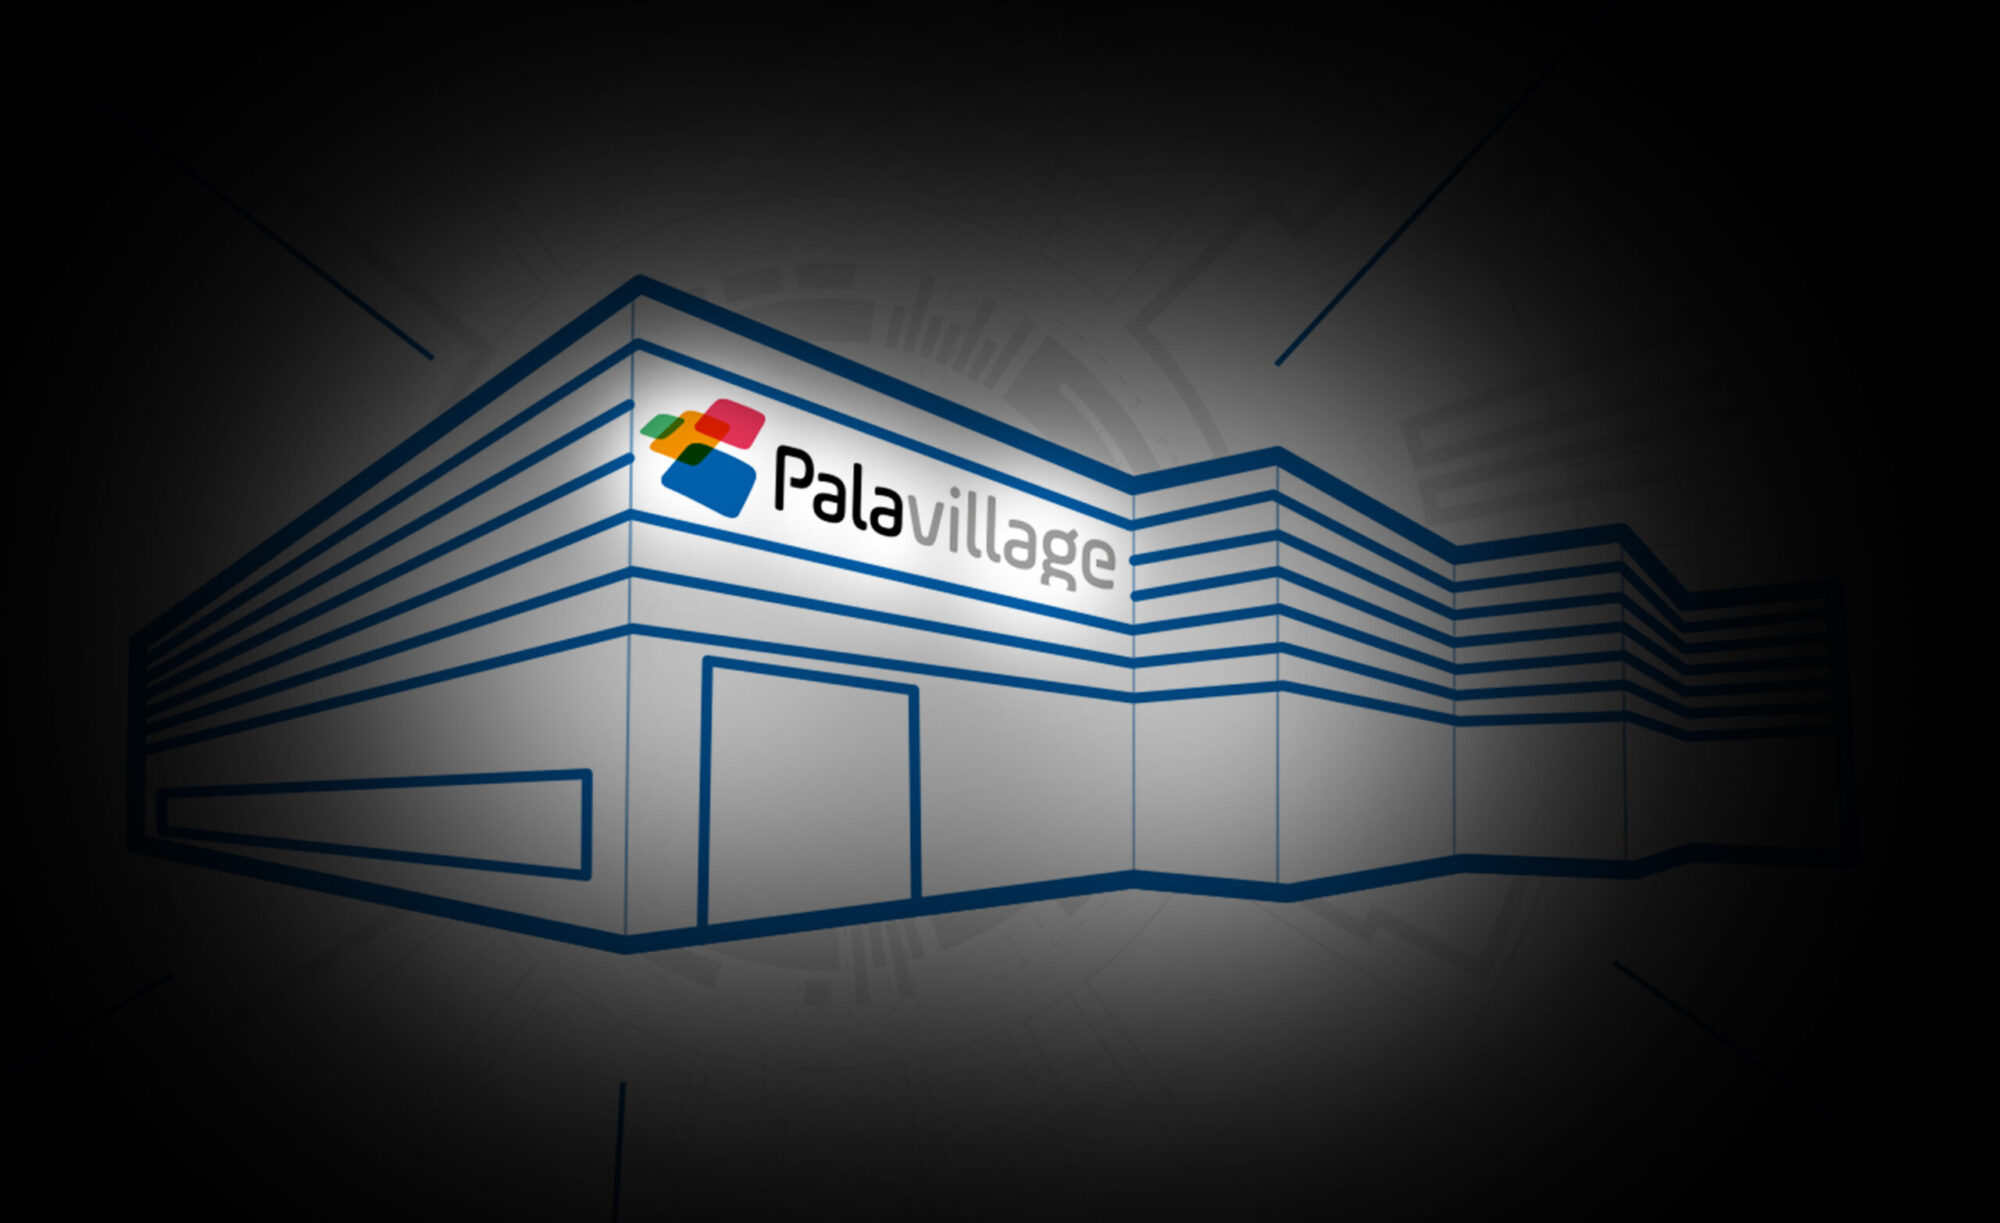 PALAVILLAGE